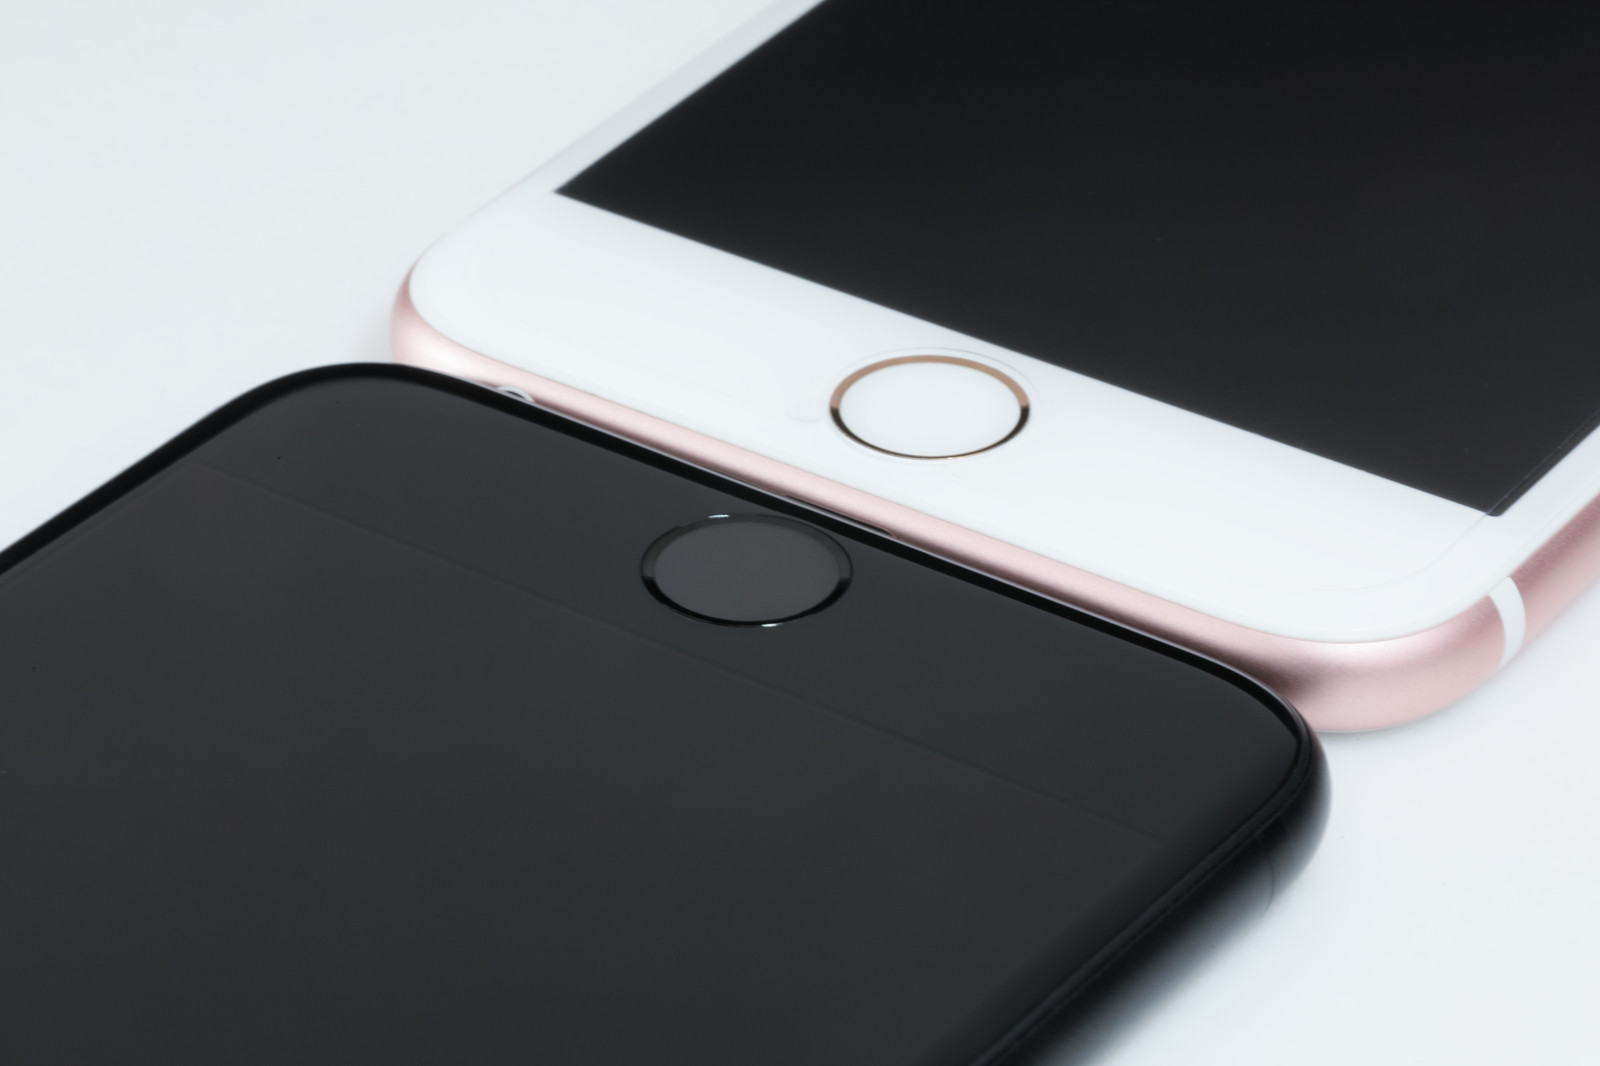 「iPhone ホームボタン フリー画像」の画像検索結果